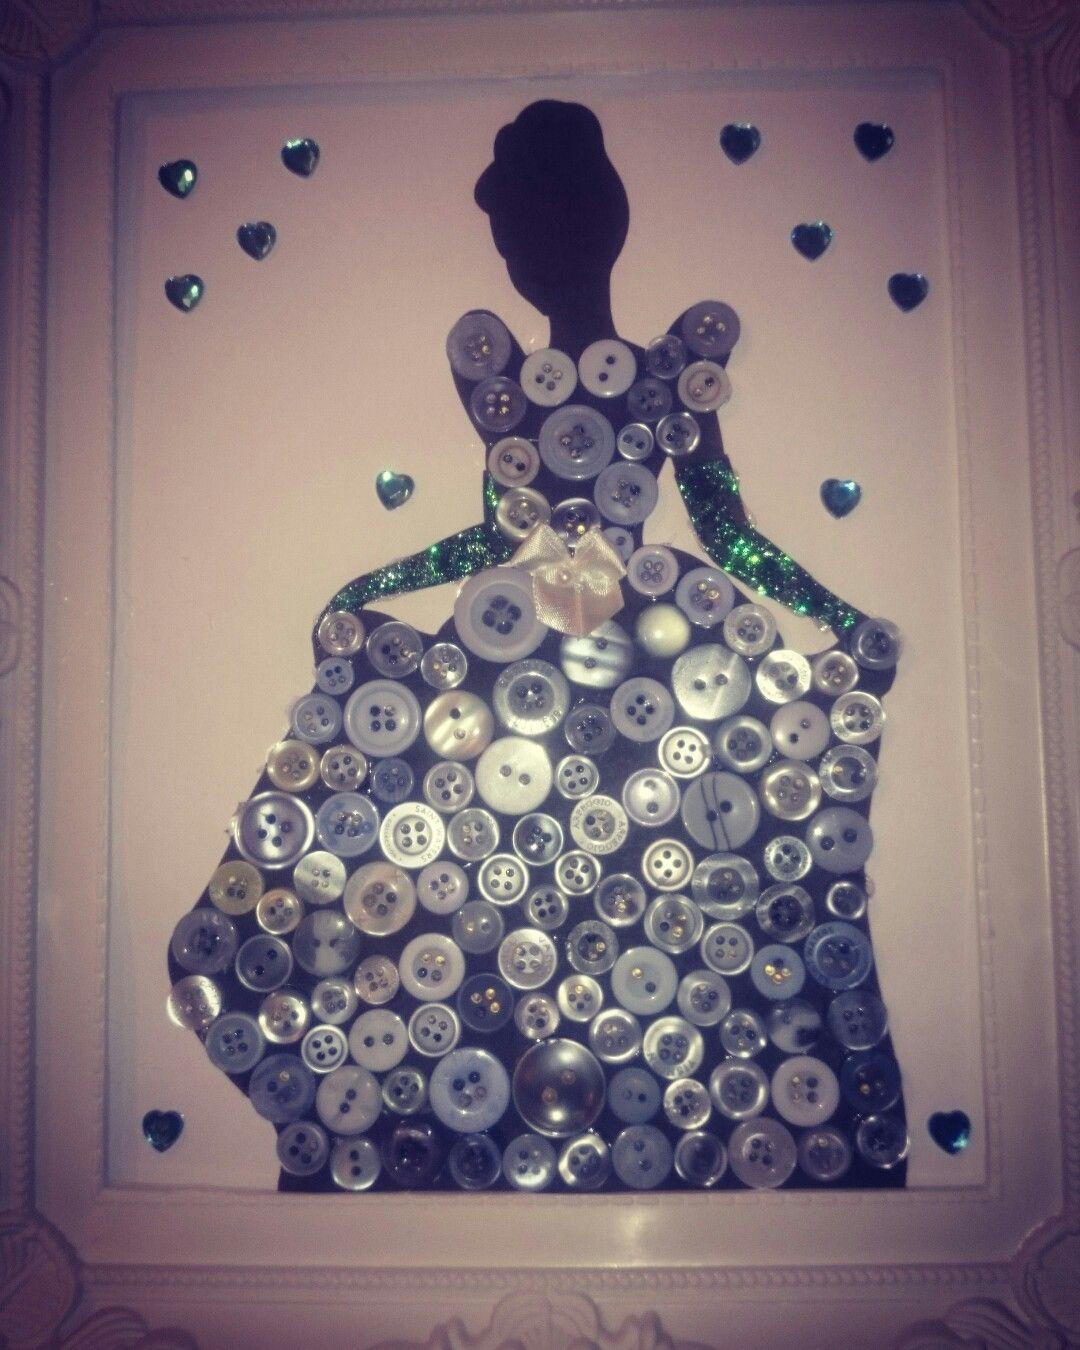 Cinderella, Disney Princess. Framed silhouette, button art. Sparkles ...